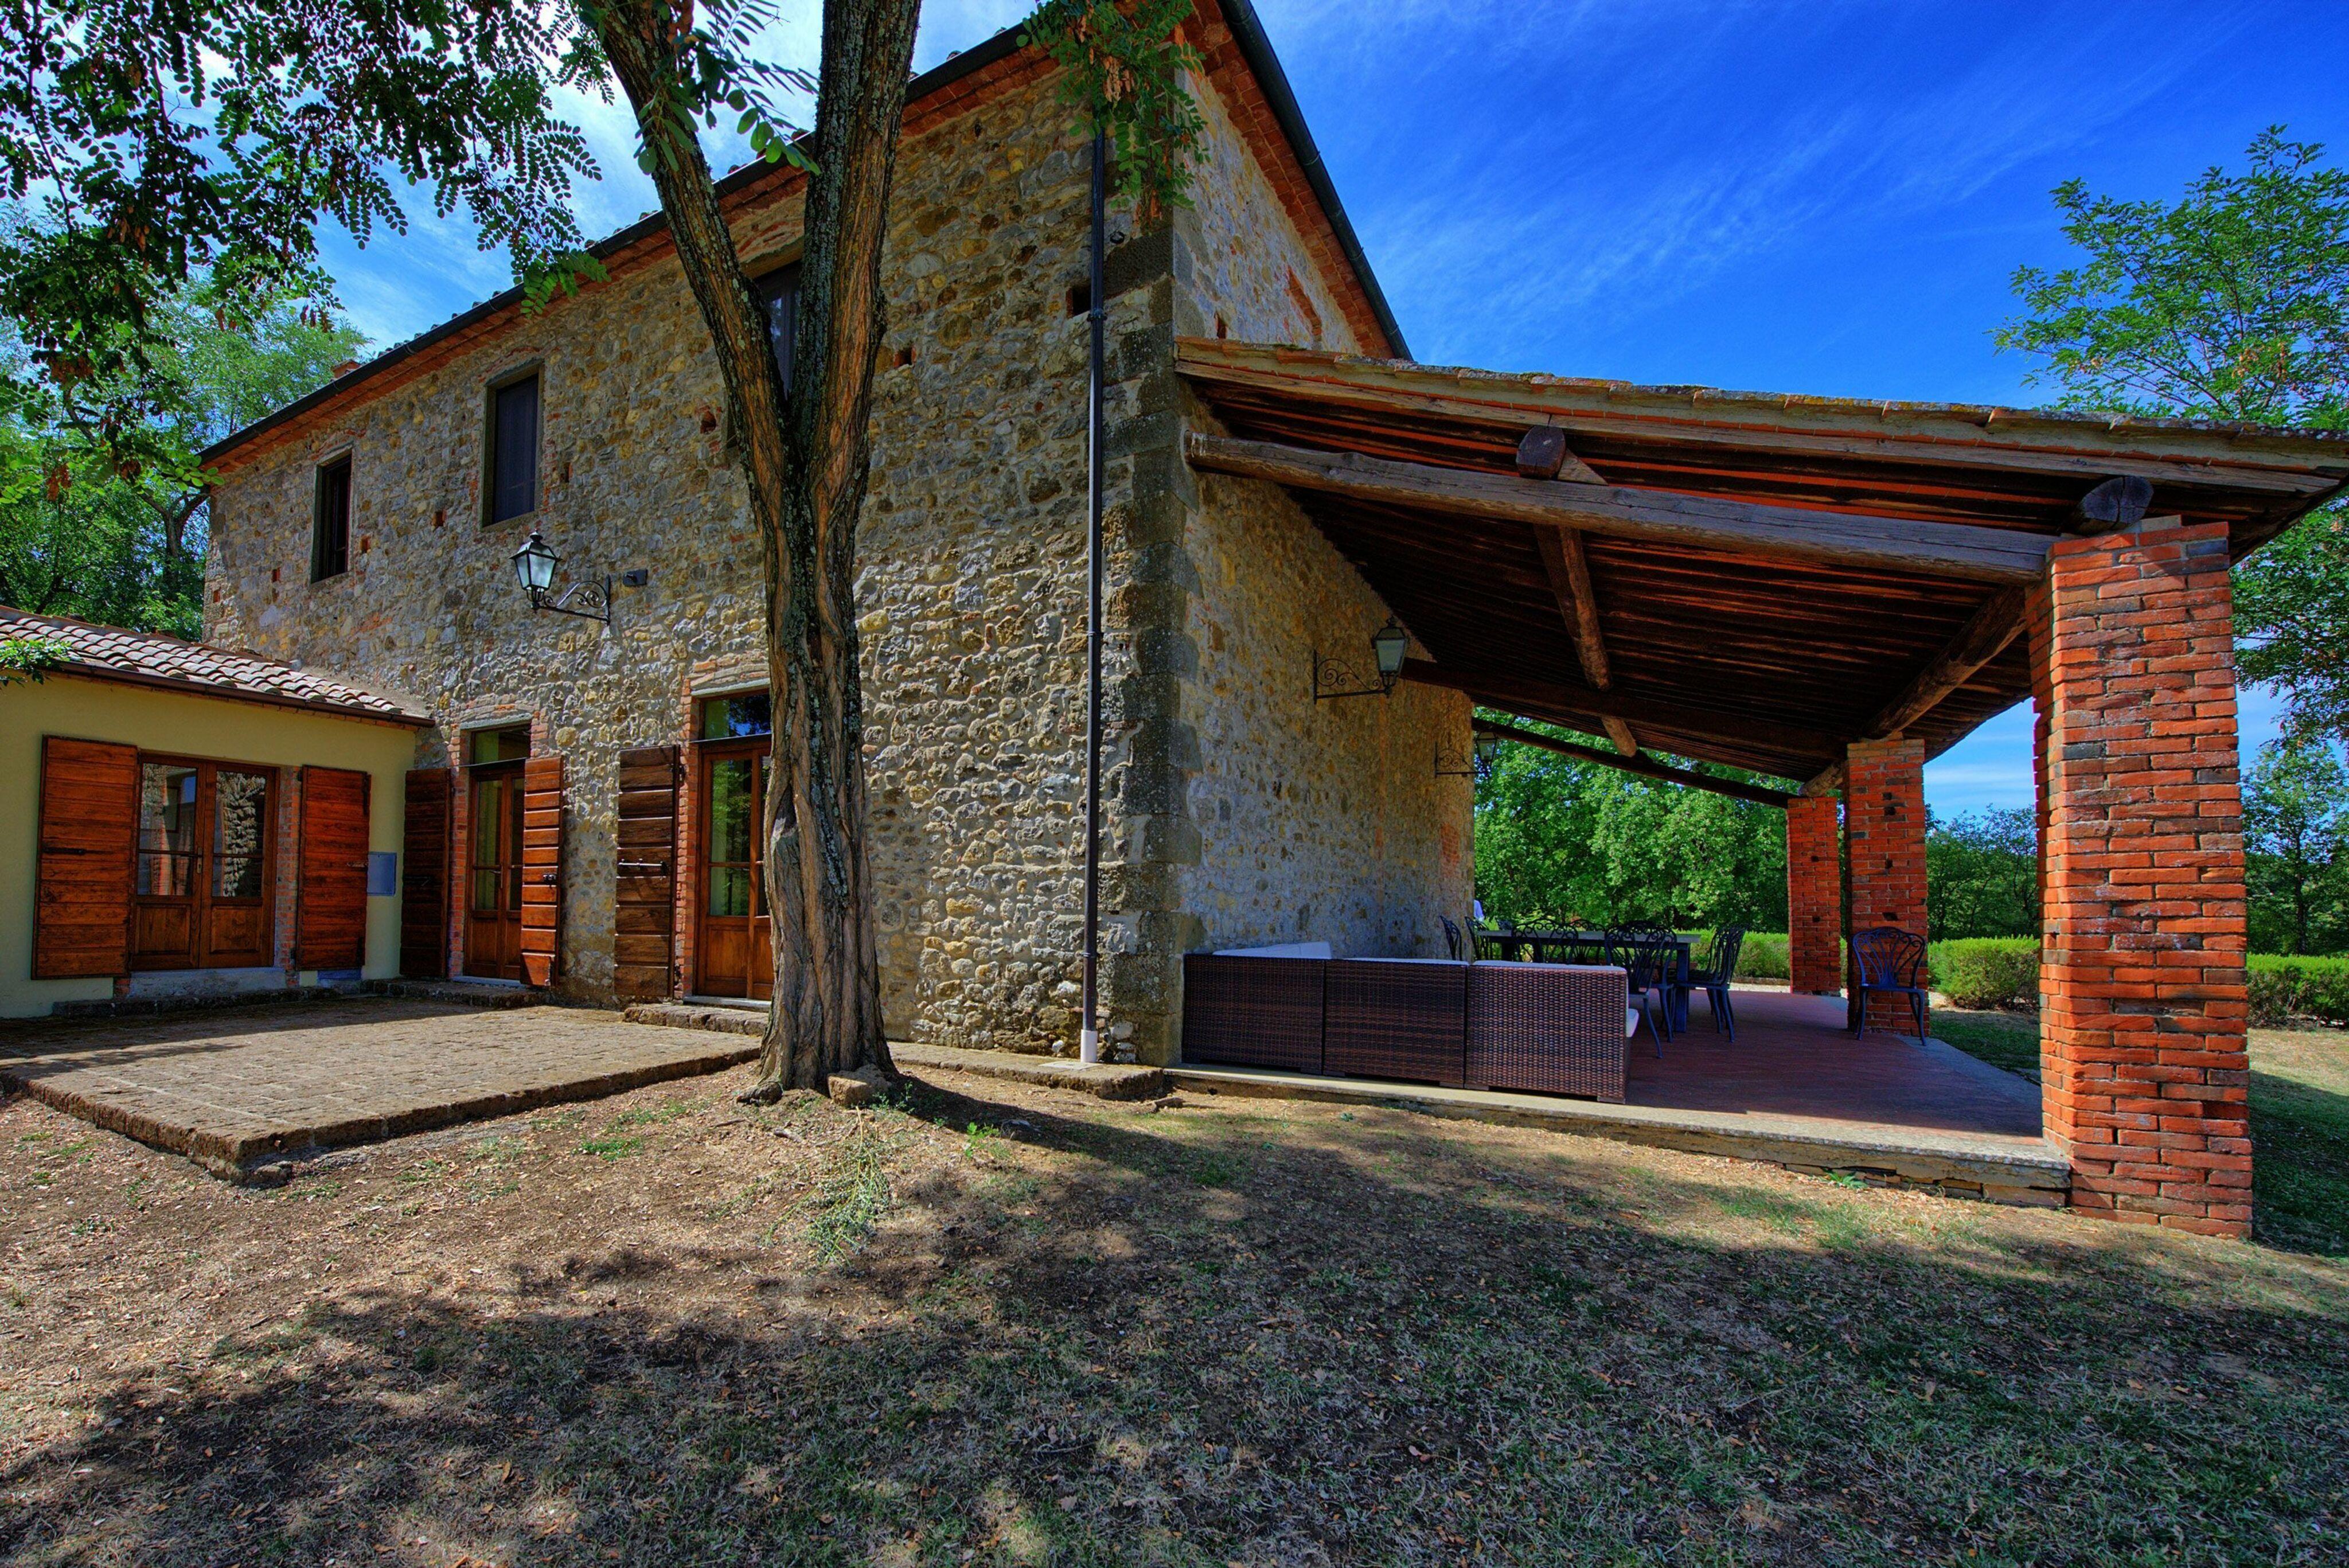 Villa Fabbriimage 29